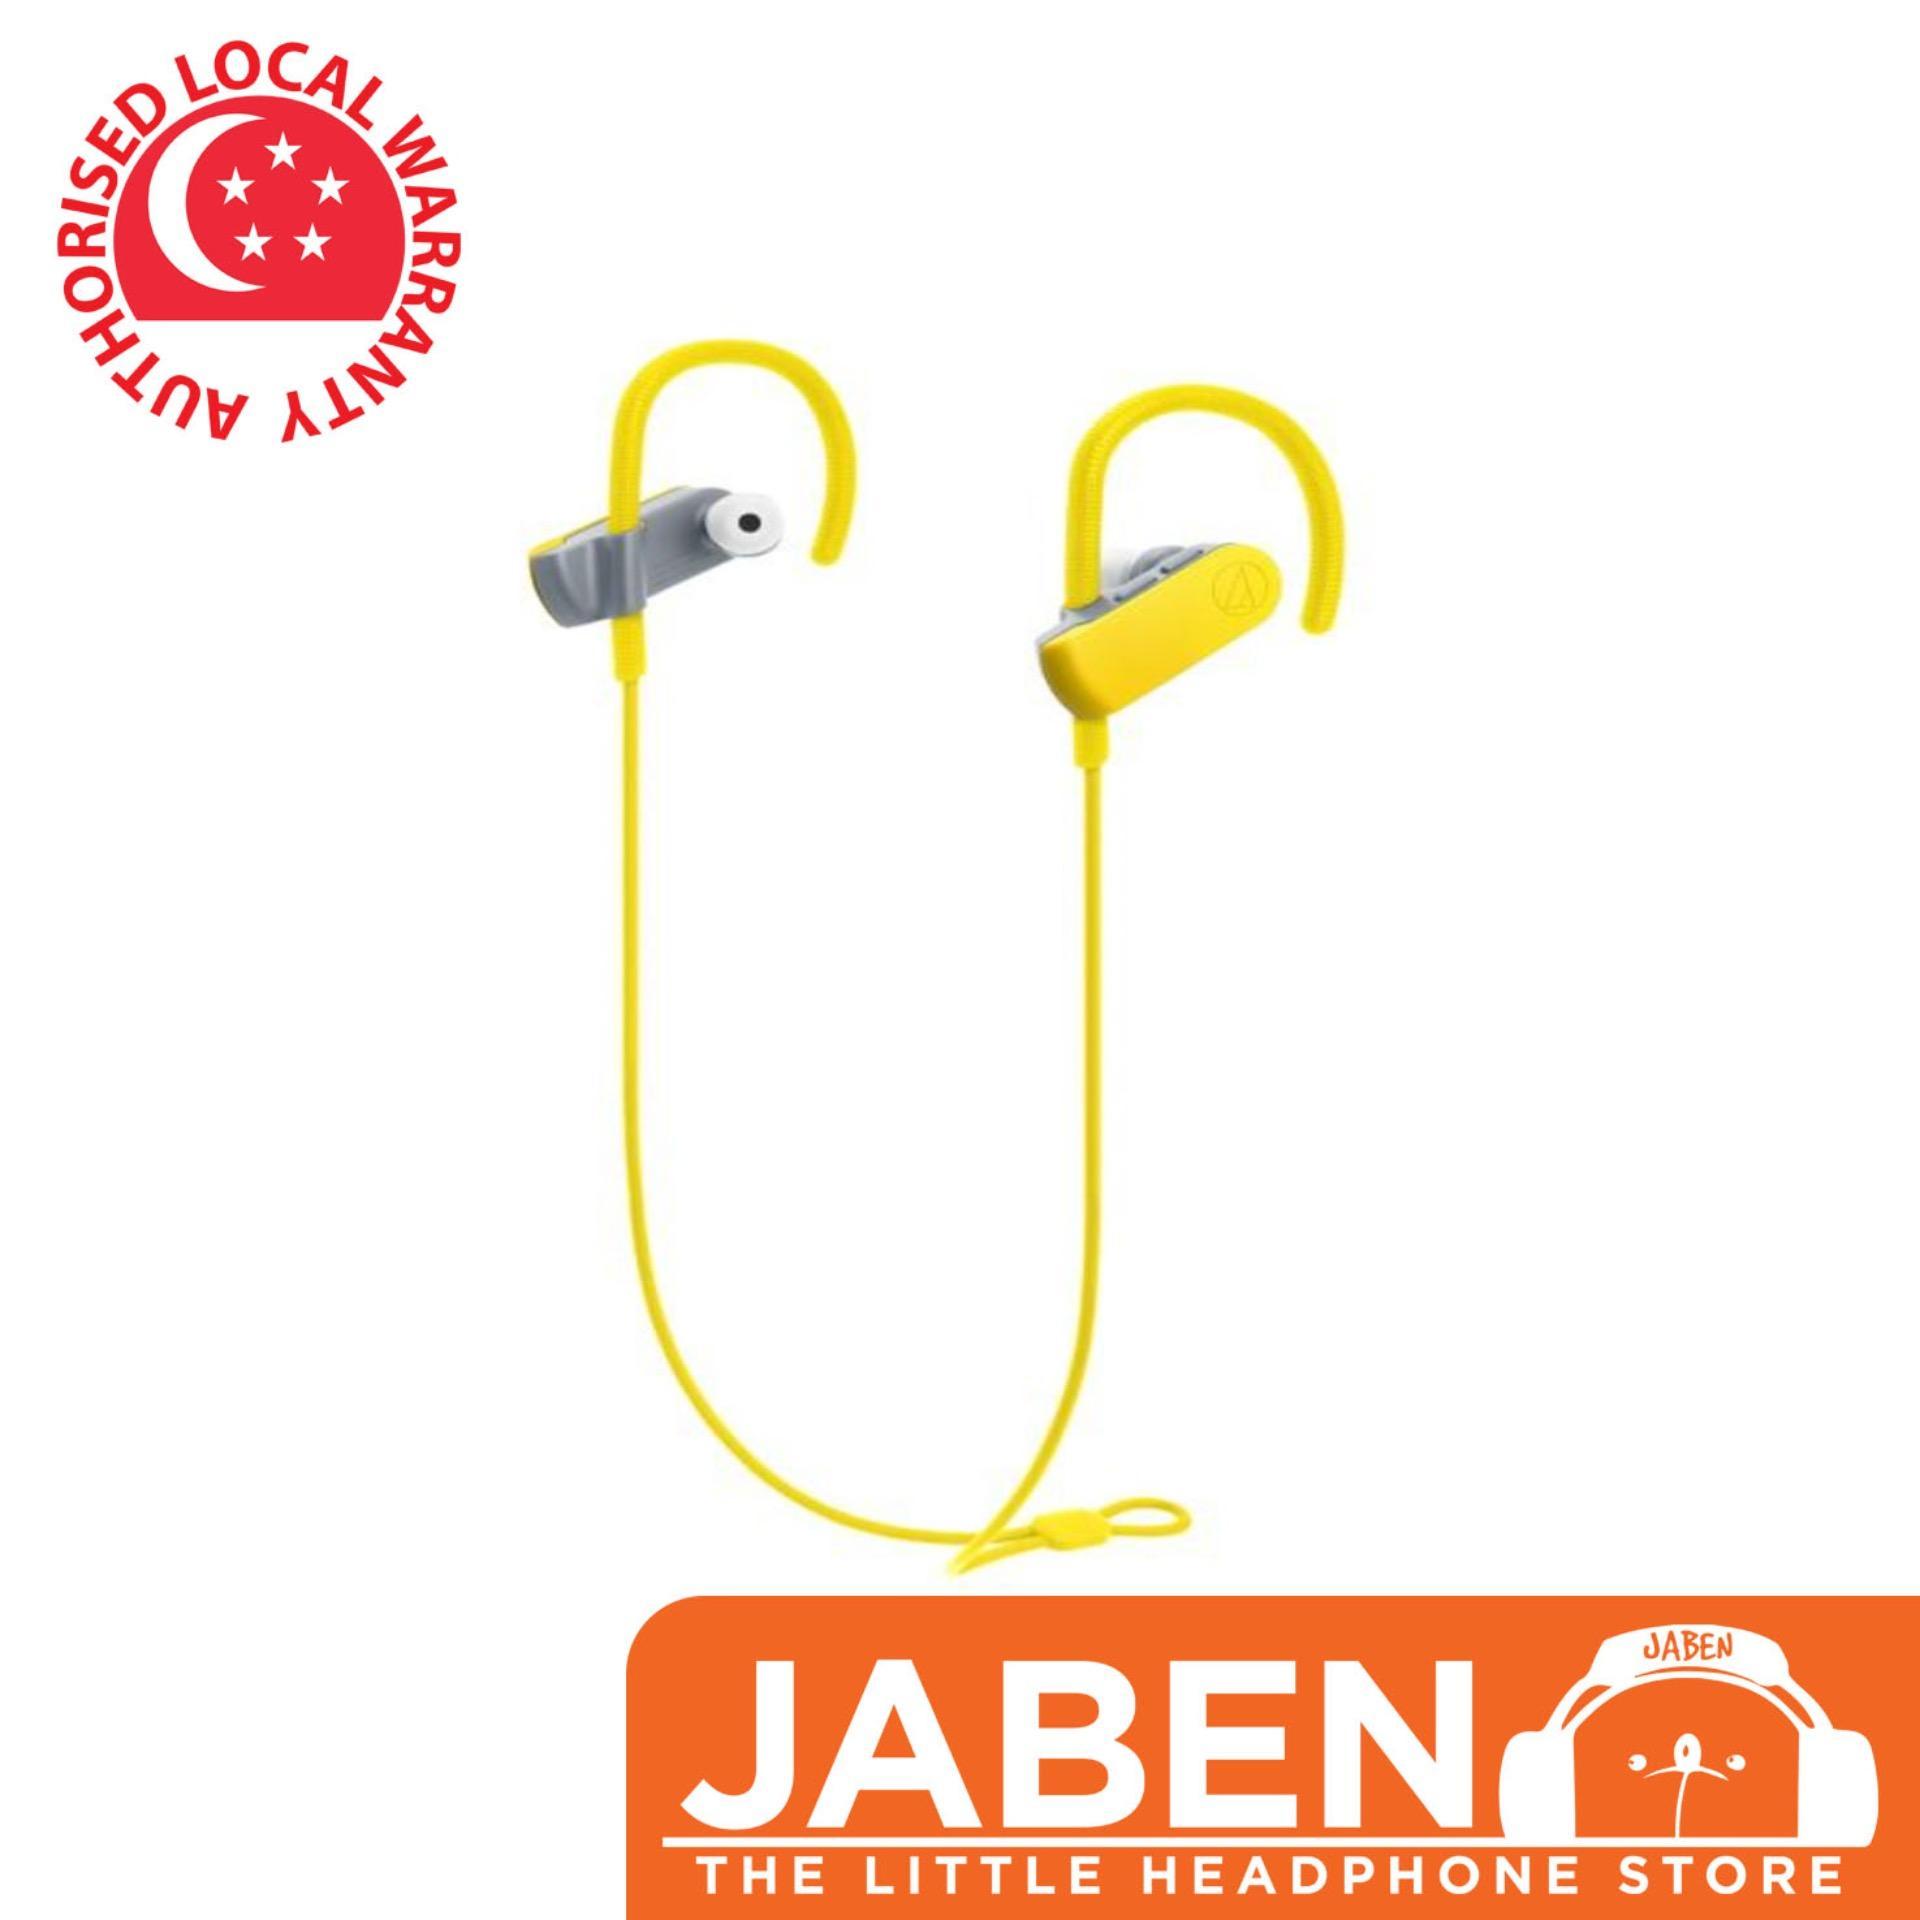 Latest Audio Technica In Ear Headphones Products Enjoy Huge Earphone Solid Bass Ath Cks1100is Sport50bt Sonicsport Wireless